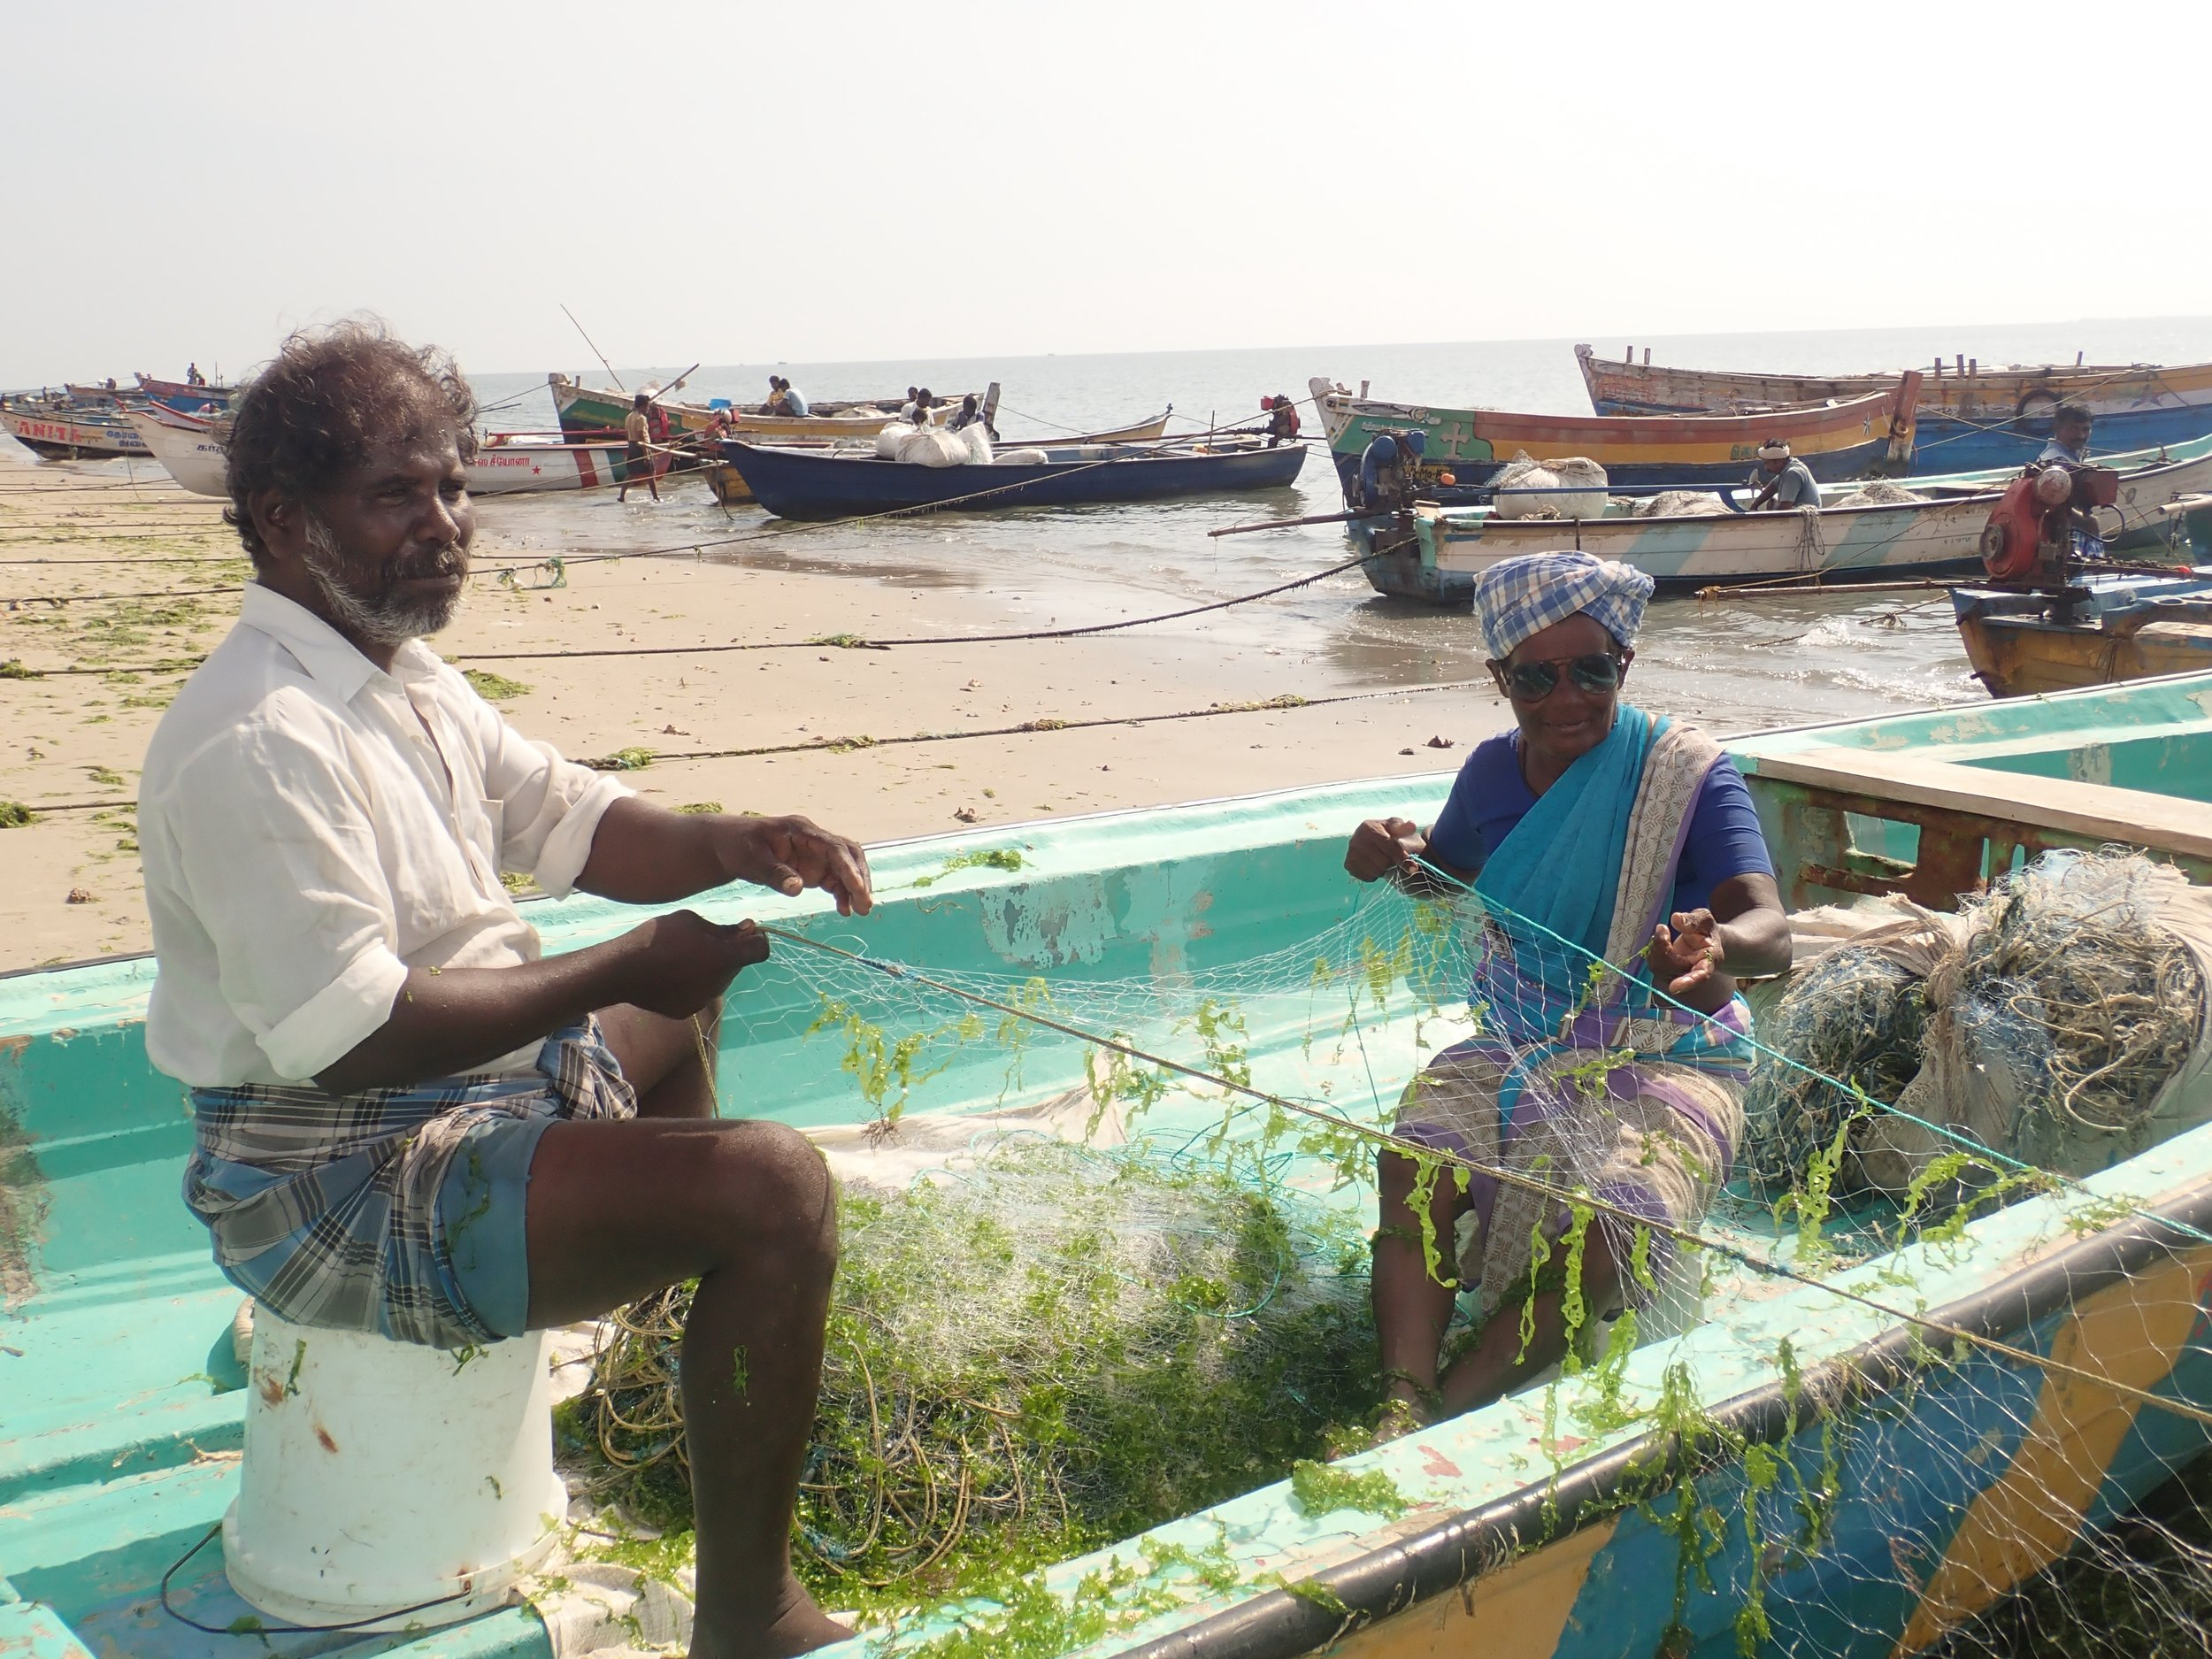 Crab gillnet fishers at Vellapatti (Tuticorin area), India. Photo by Amanda Vincent/Project Seahorse.